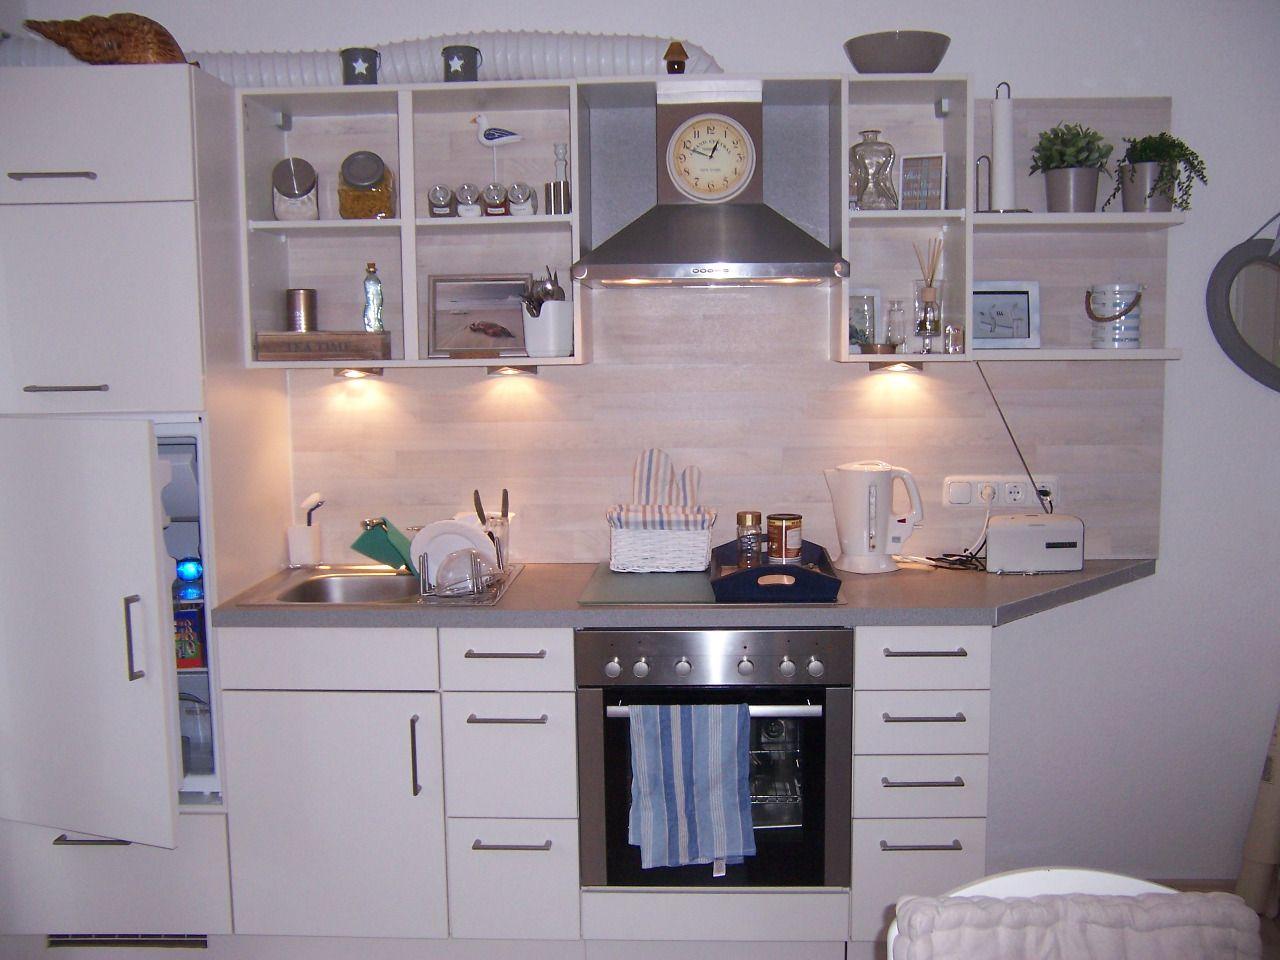 Aus alt mach neu: Offene Küche | Interior , Ideen, DIY | Pinterest